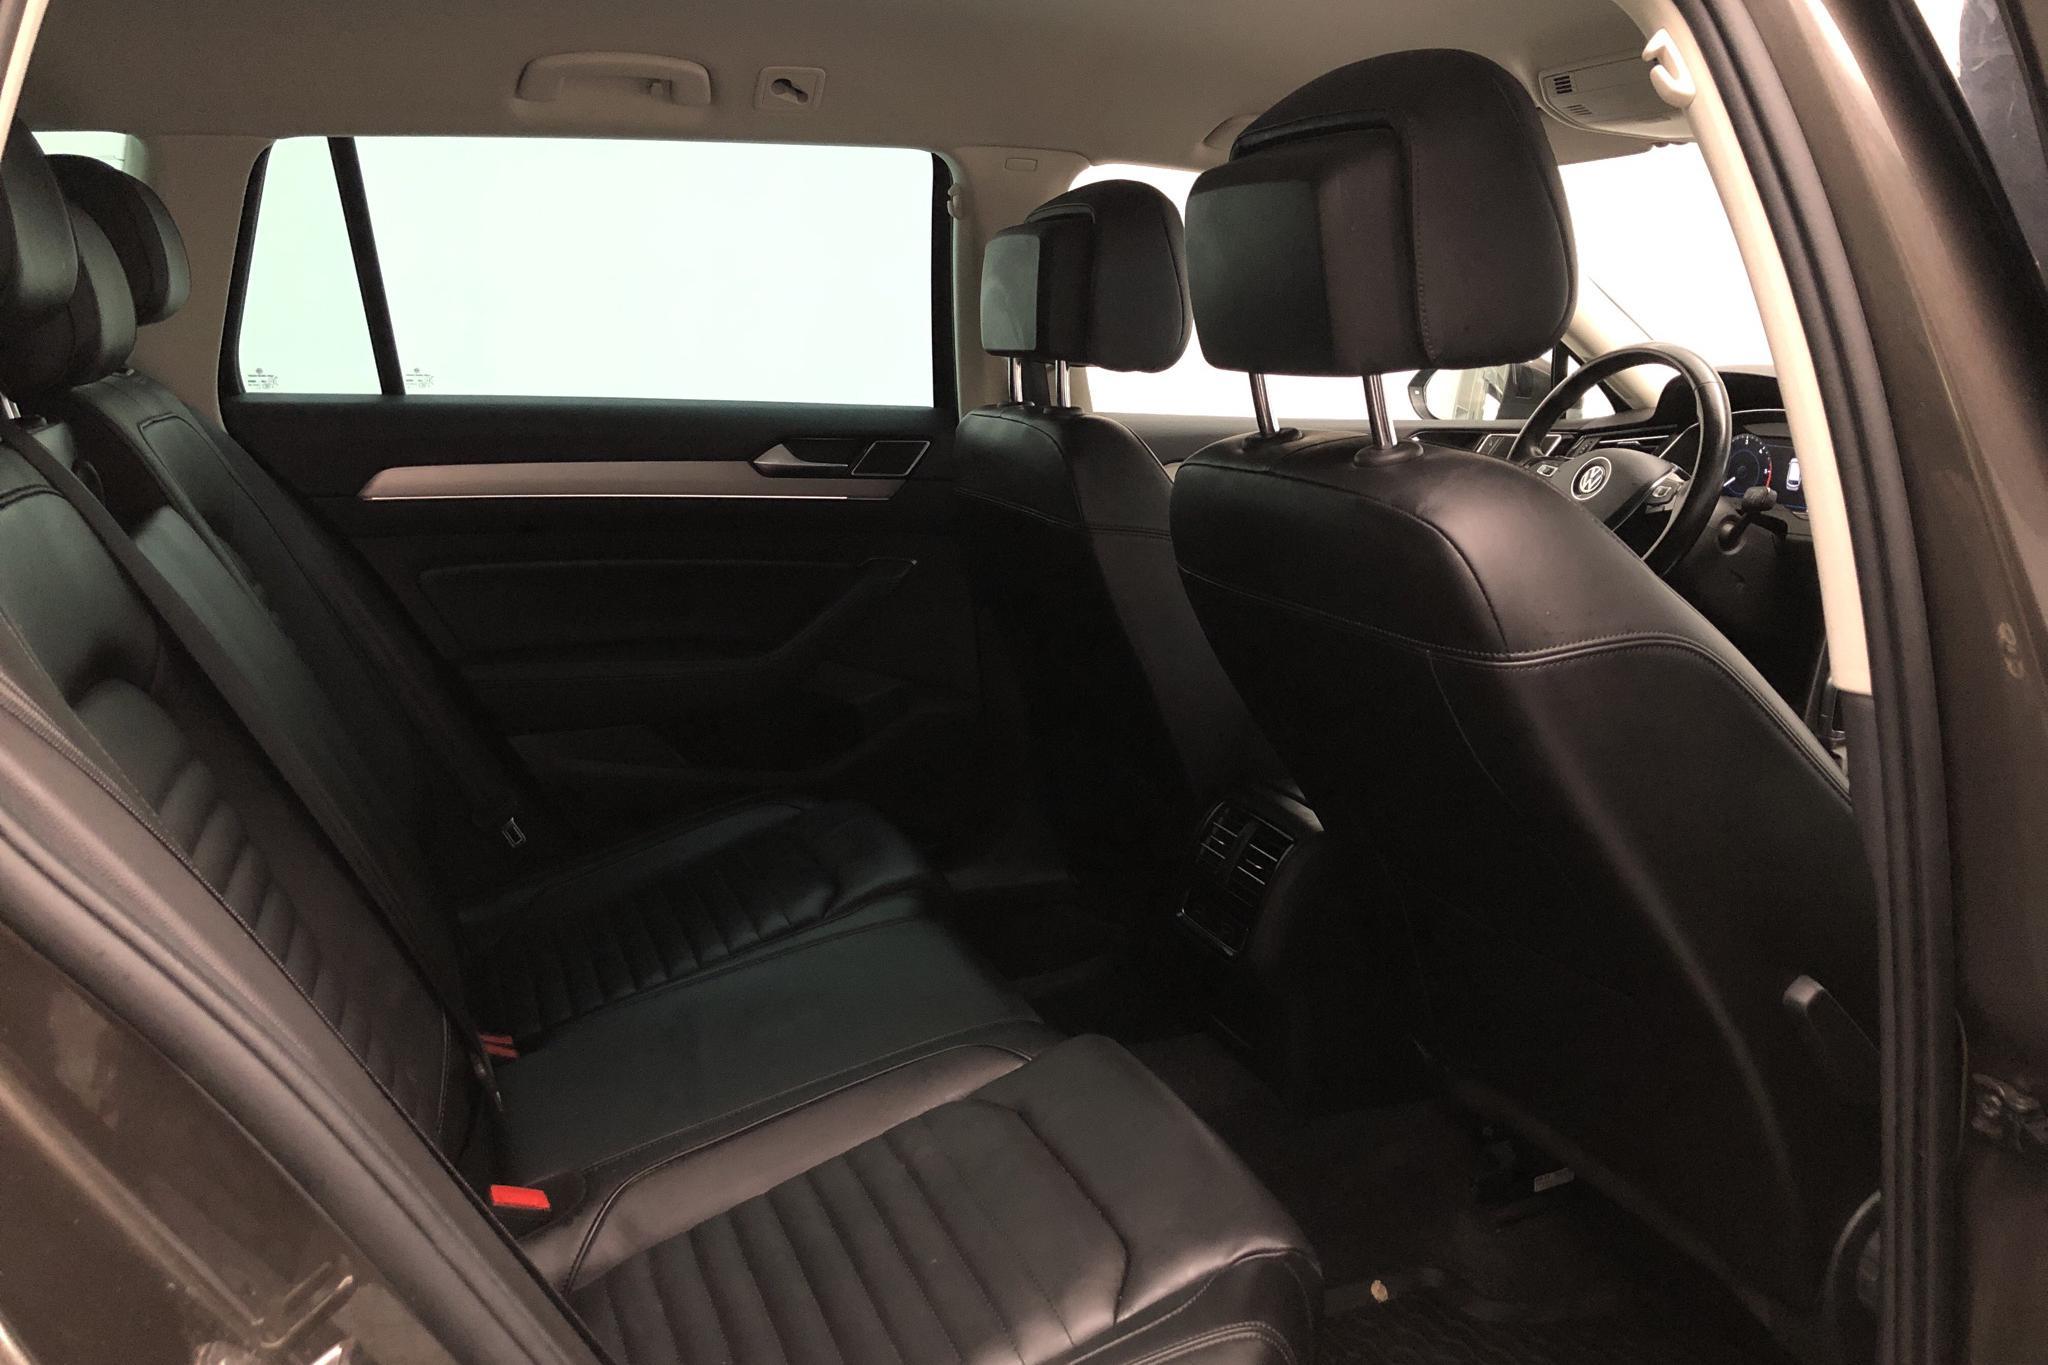 VW Passat 2.0 TDI Sportscombi 4MOTION (190hk) - 8 436 mil - Automat - Dark Brown - 2018